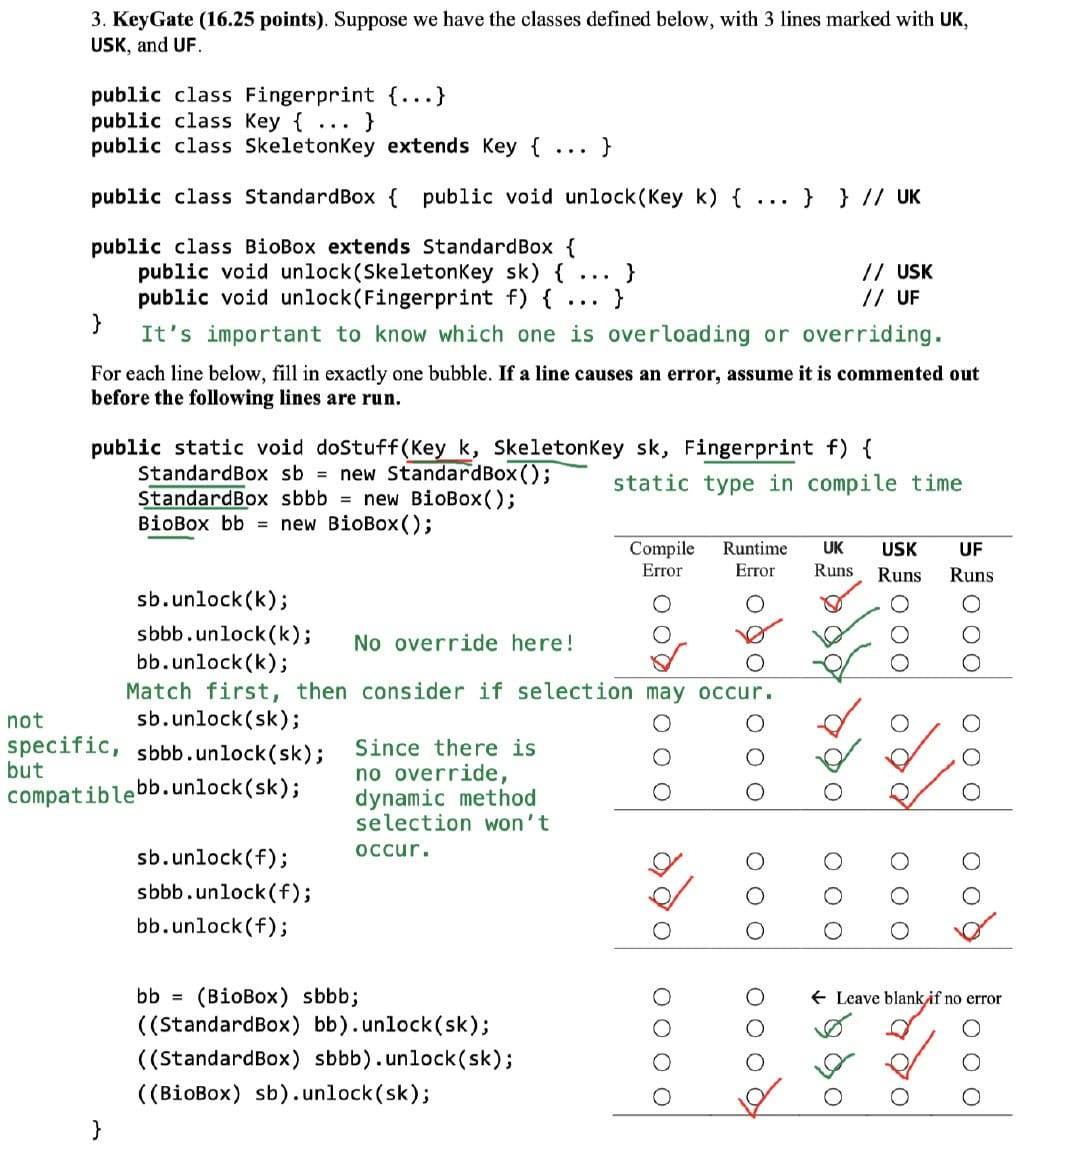 KeyGate - Method Selection Problem